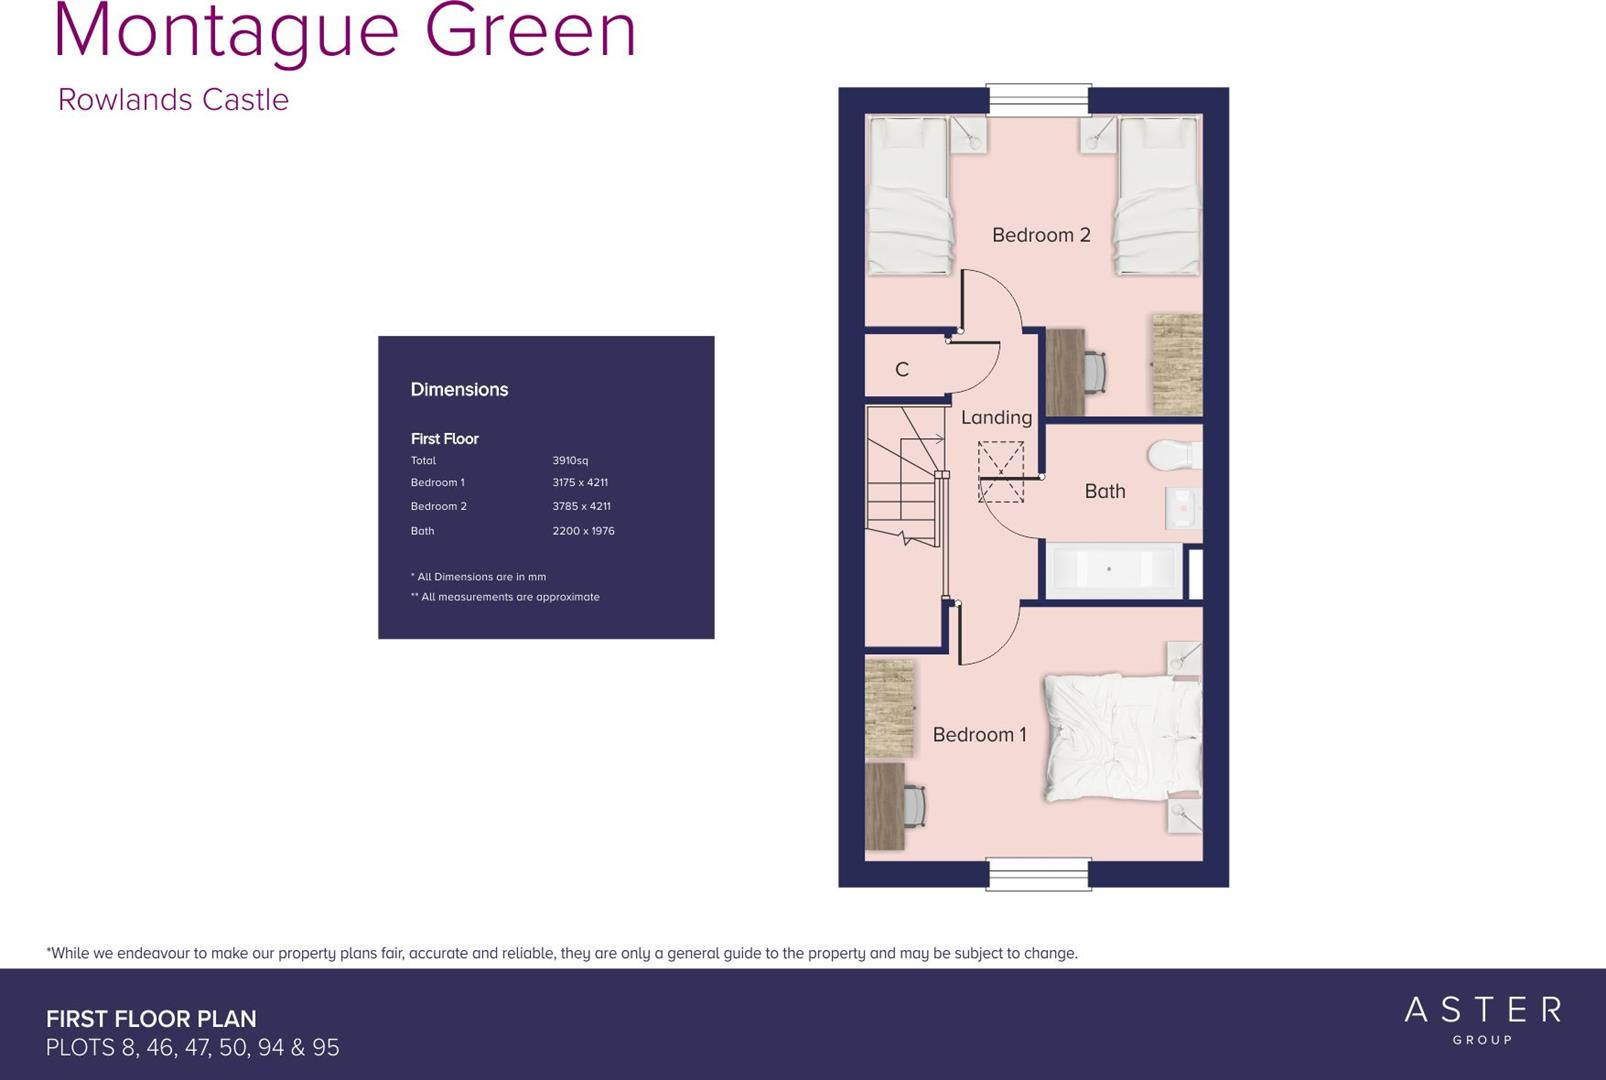 Montague GreenPlots 8, 46, 47, 50, 94 & 95_FF_F.jp